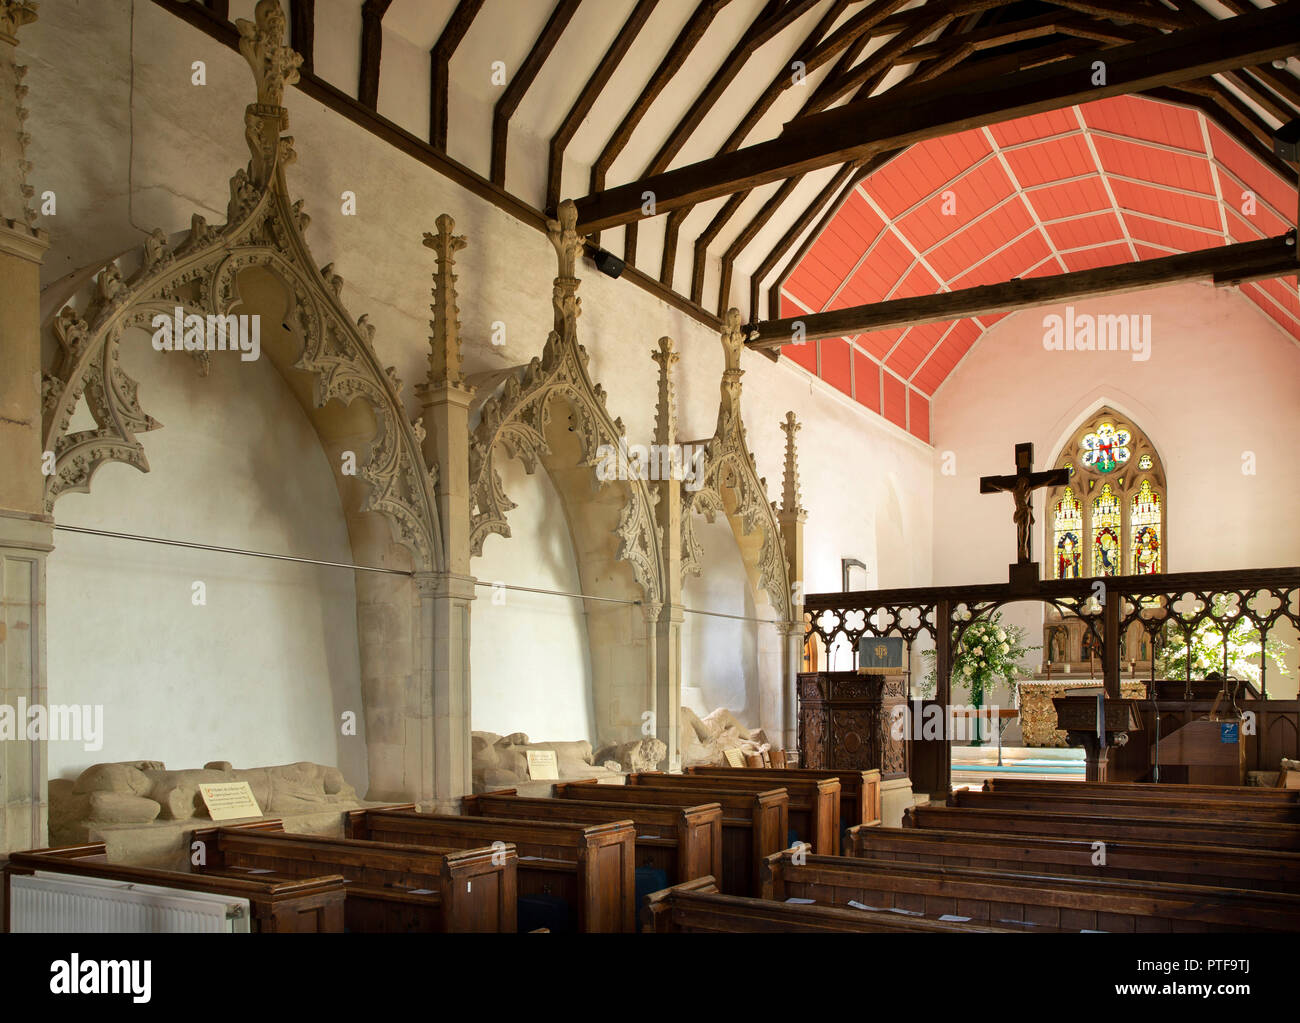 England, Berkshire, Aldworth, St Mary's church, Aldworth Giants, de la Beche family effigies beside pews in nave Stock Photo